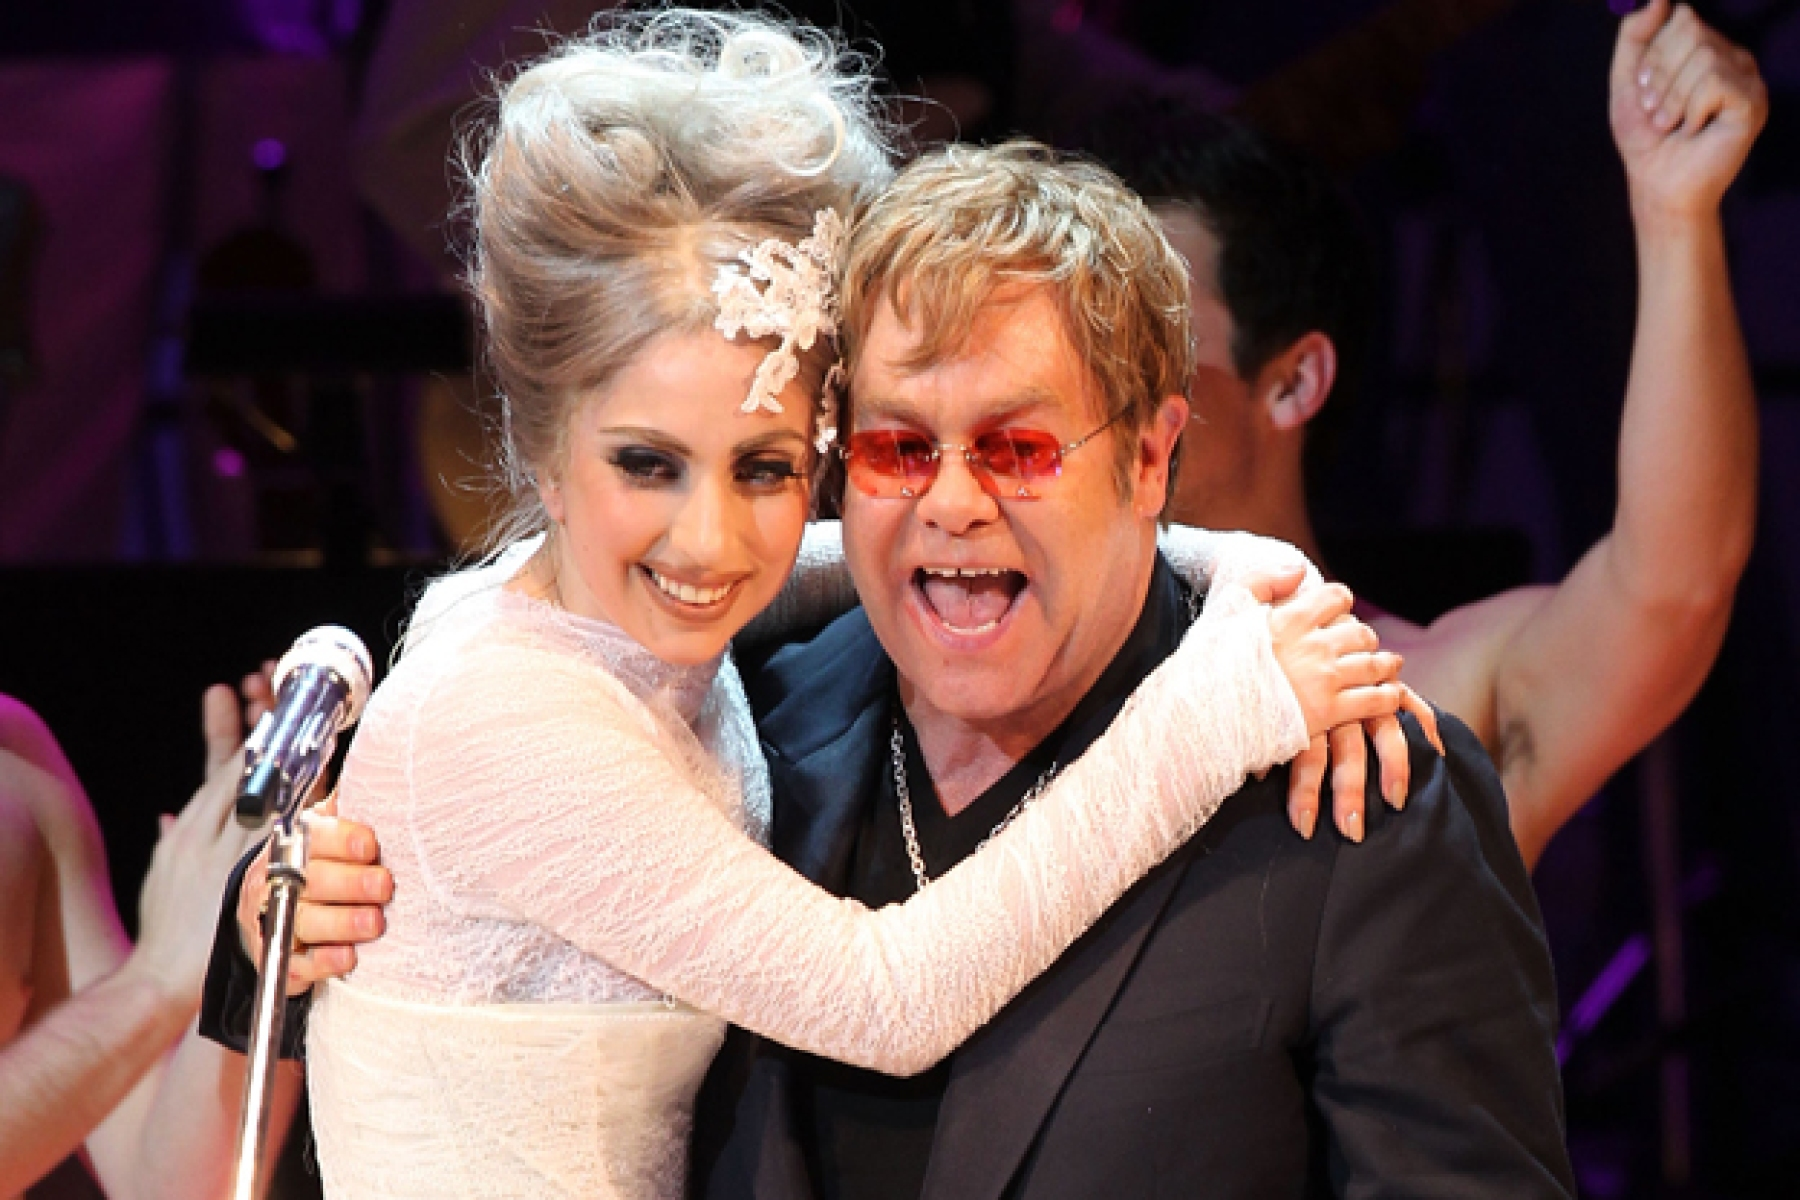 Lady Gaga and Elton John perform in New York City.